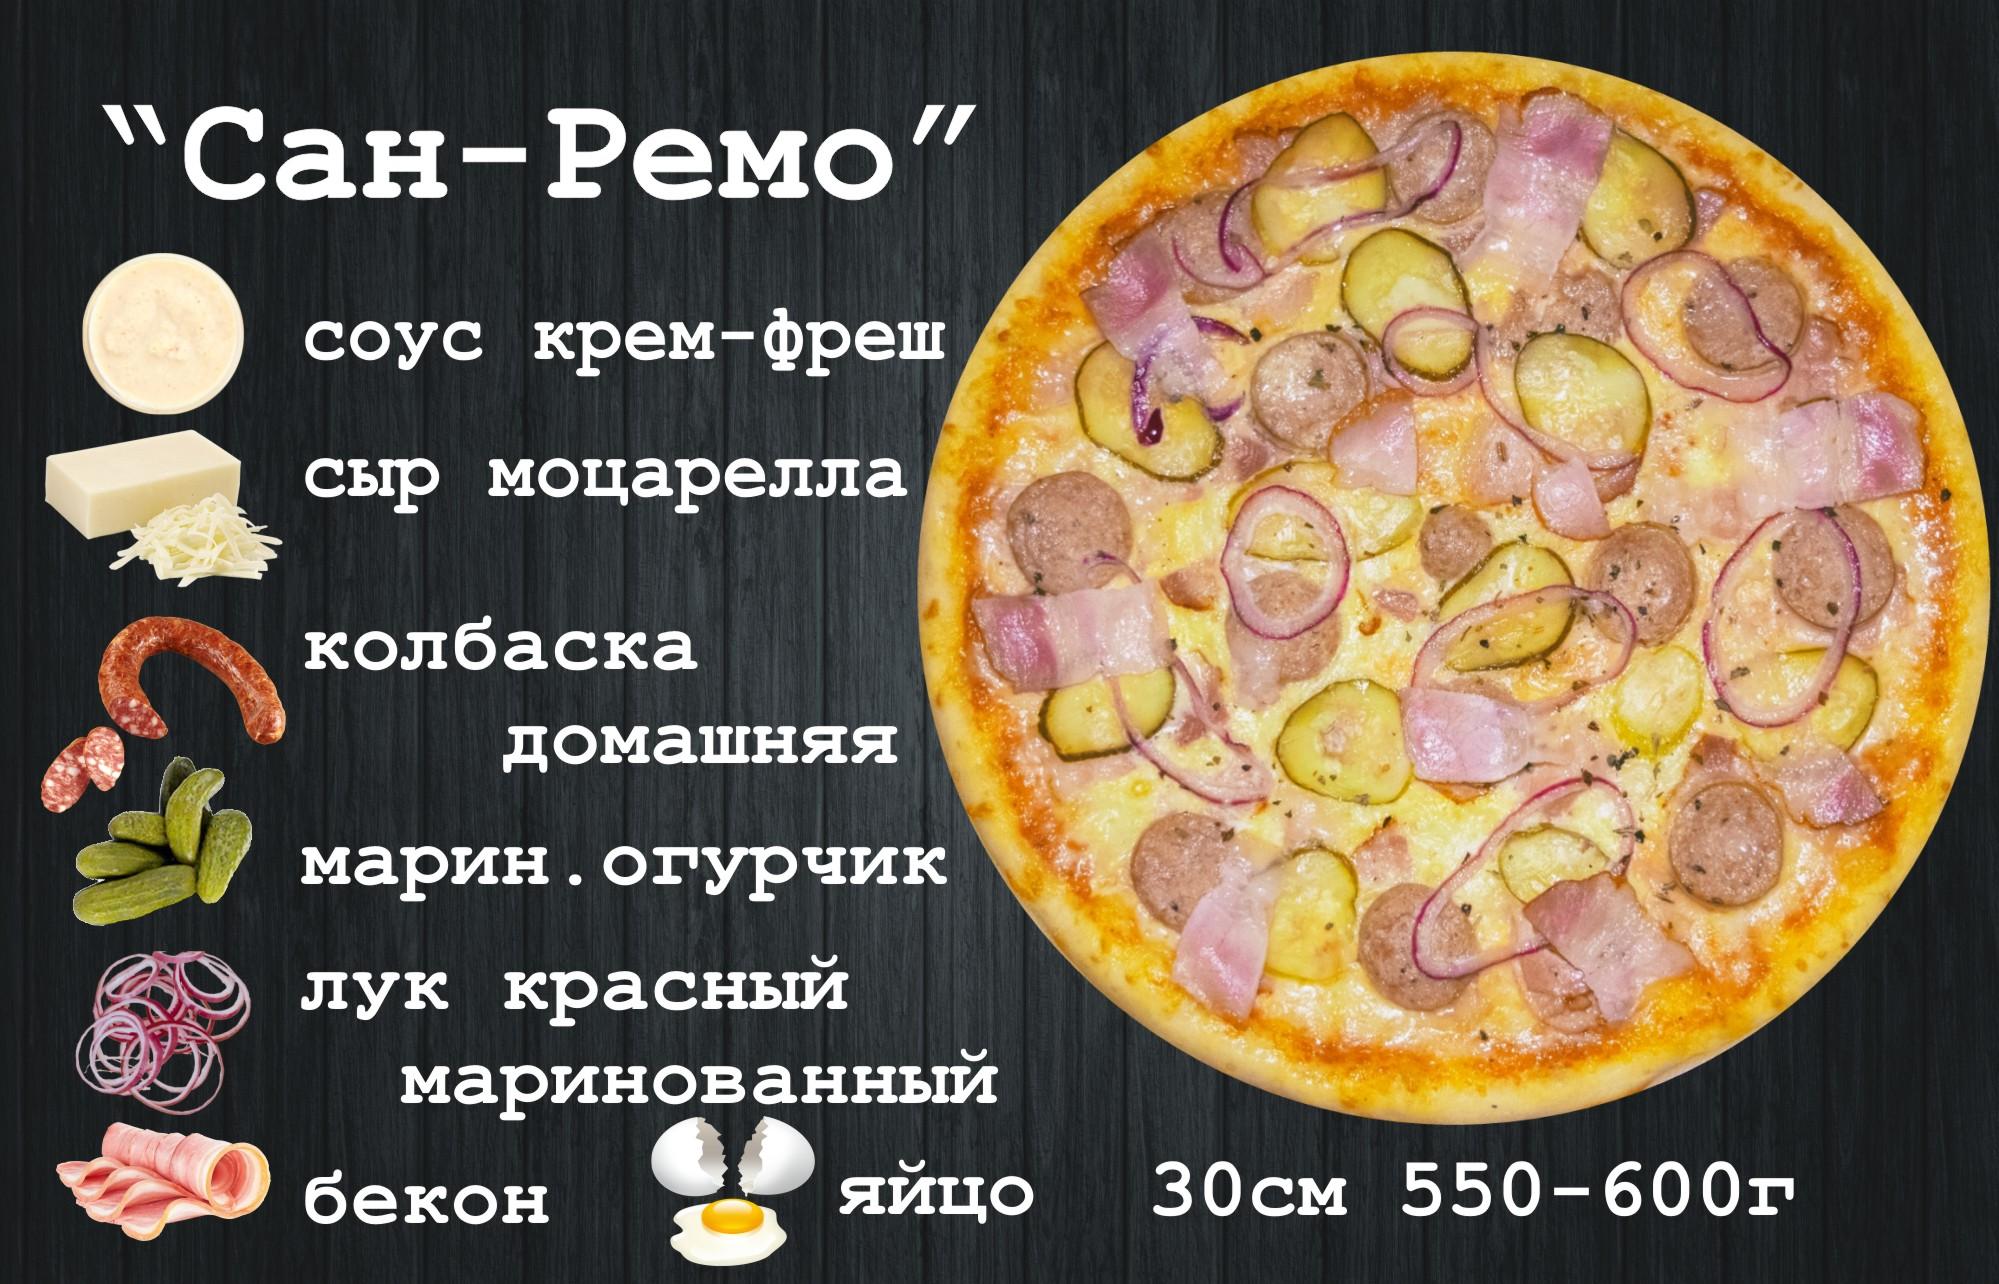 Сан_ремо_pizza_urbanfood_minsk